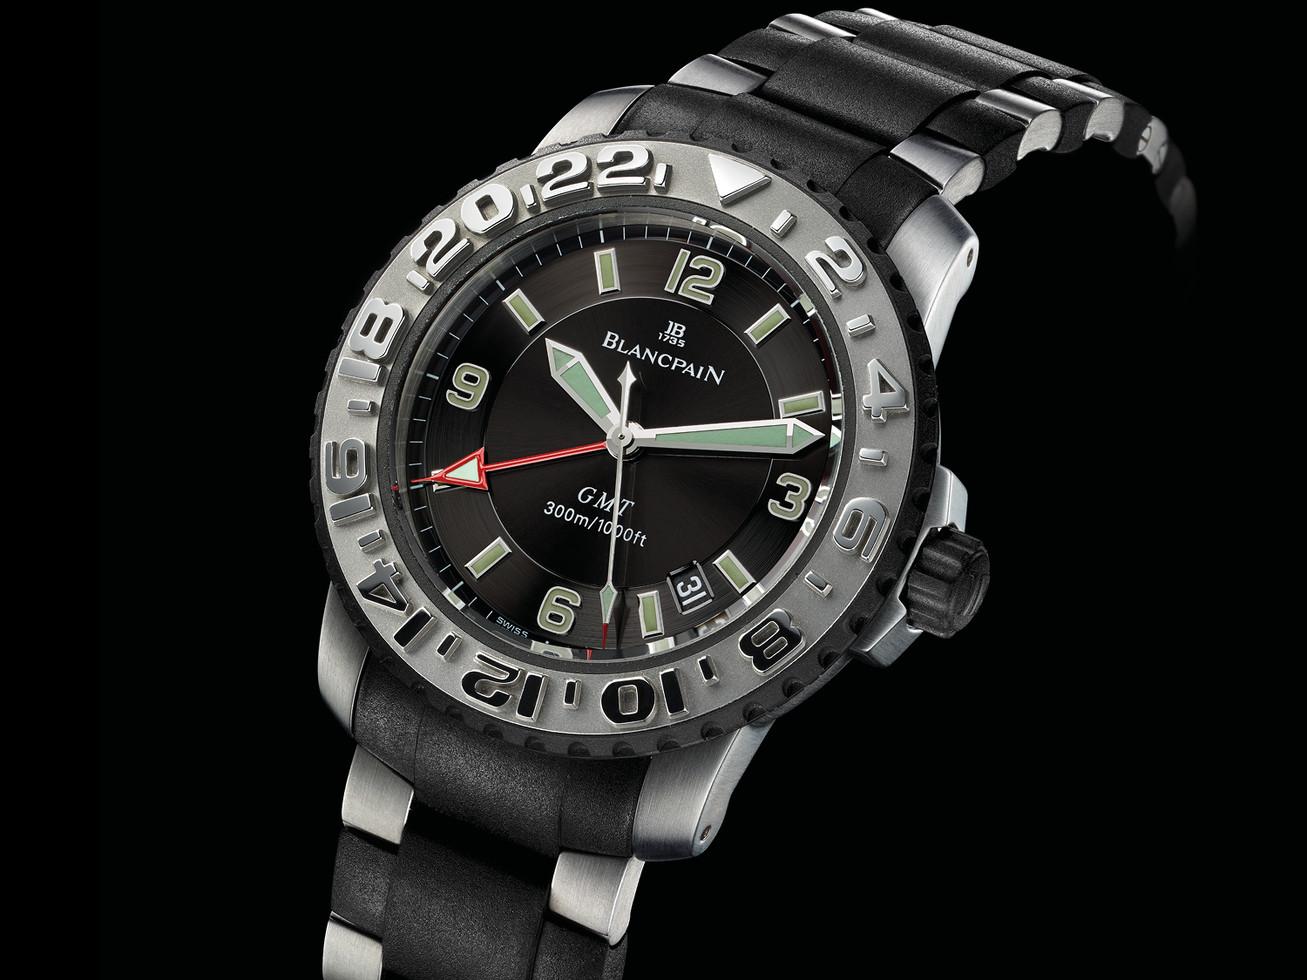 Concept 2000 GMT 24